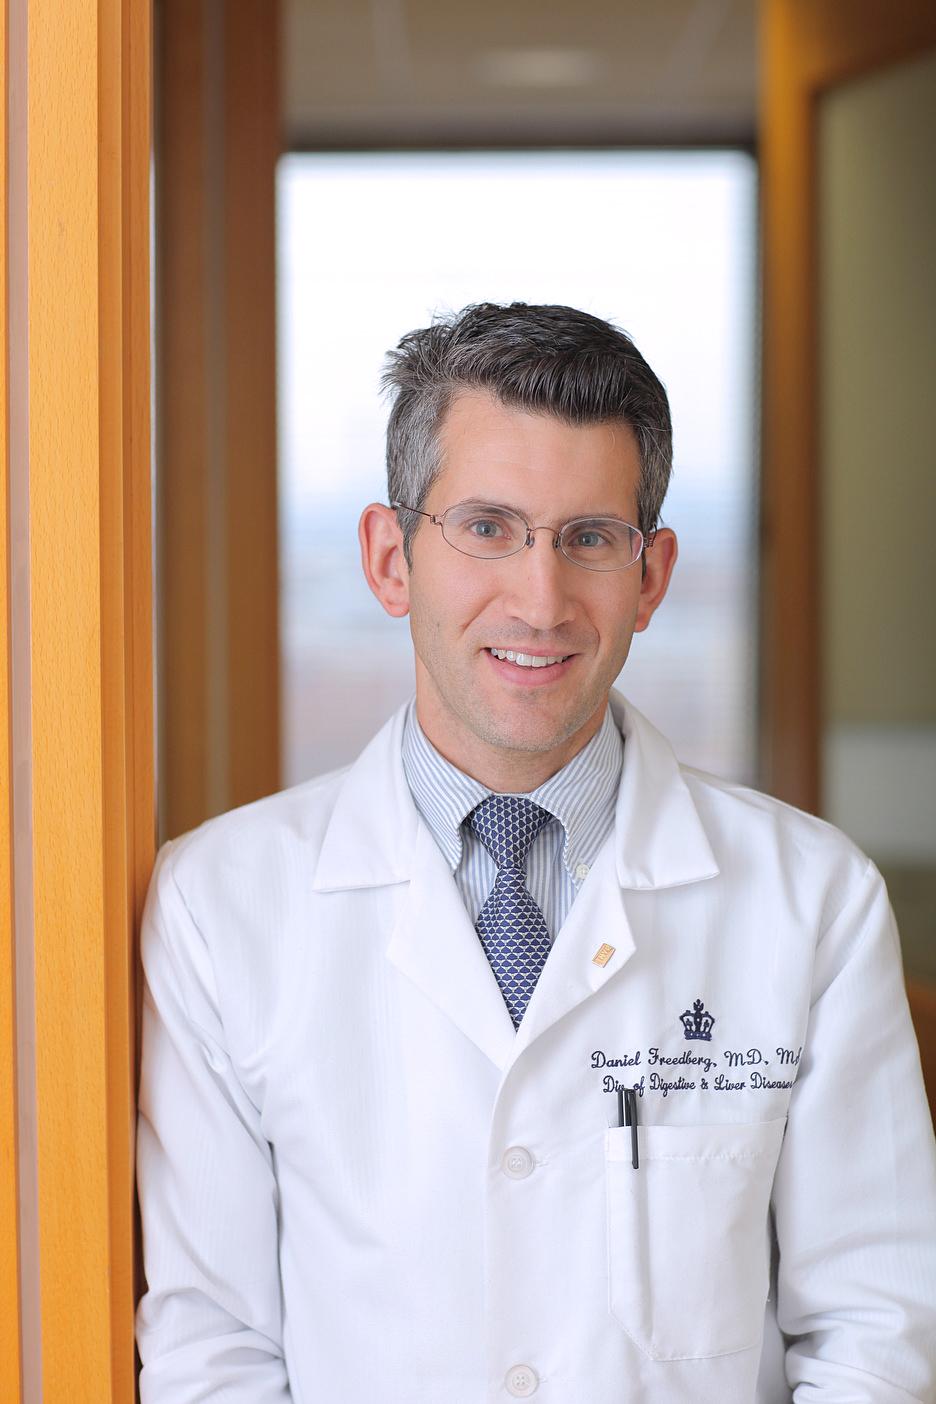 Columbia Digestive and Liver Disease_November 13, 2014 Photographs: John Abbott